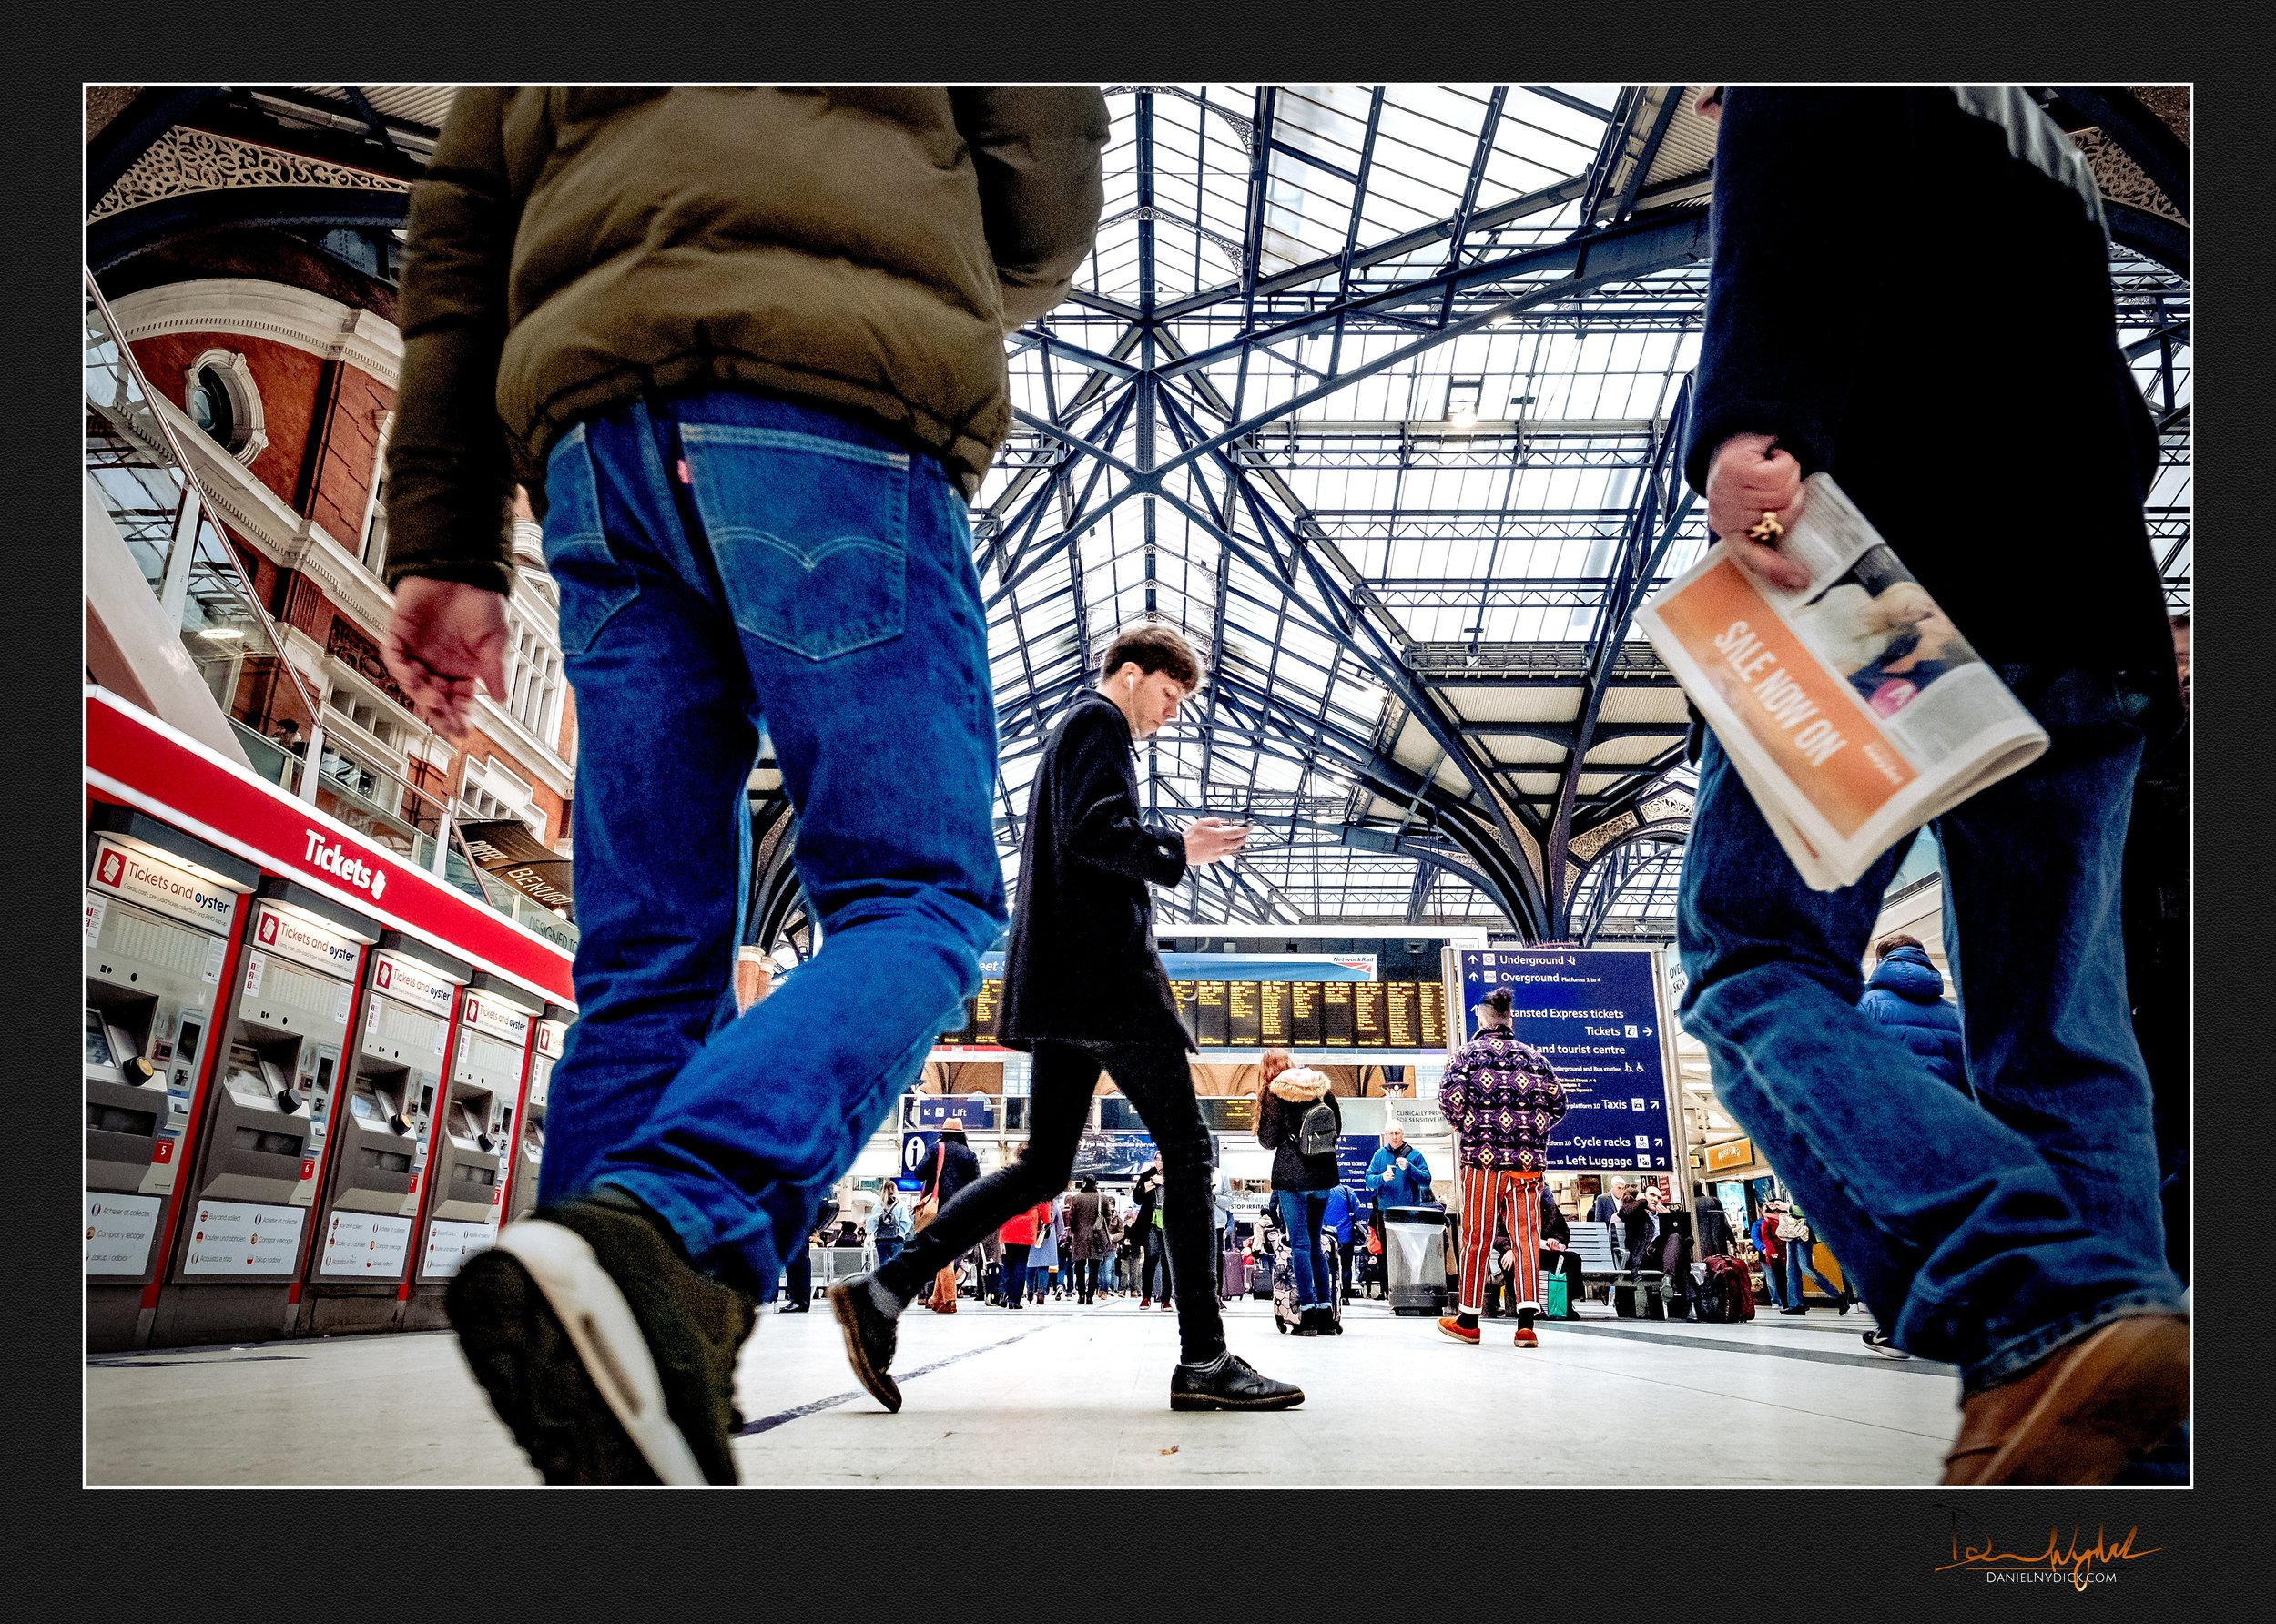 liverpool station, tube, train, street photography